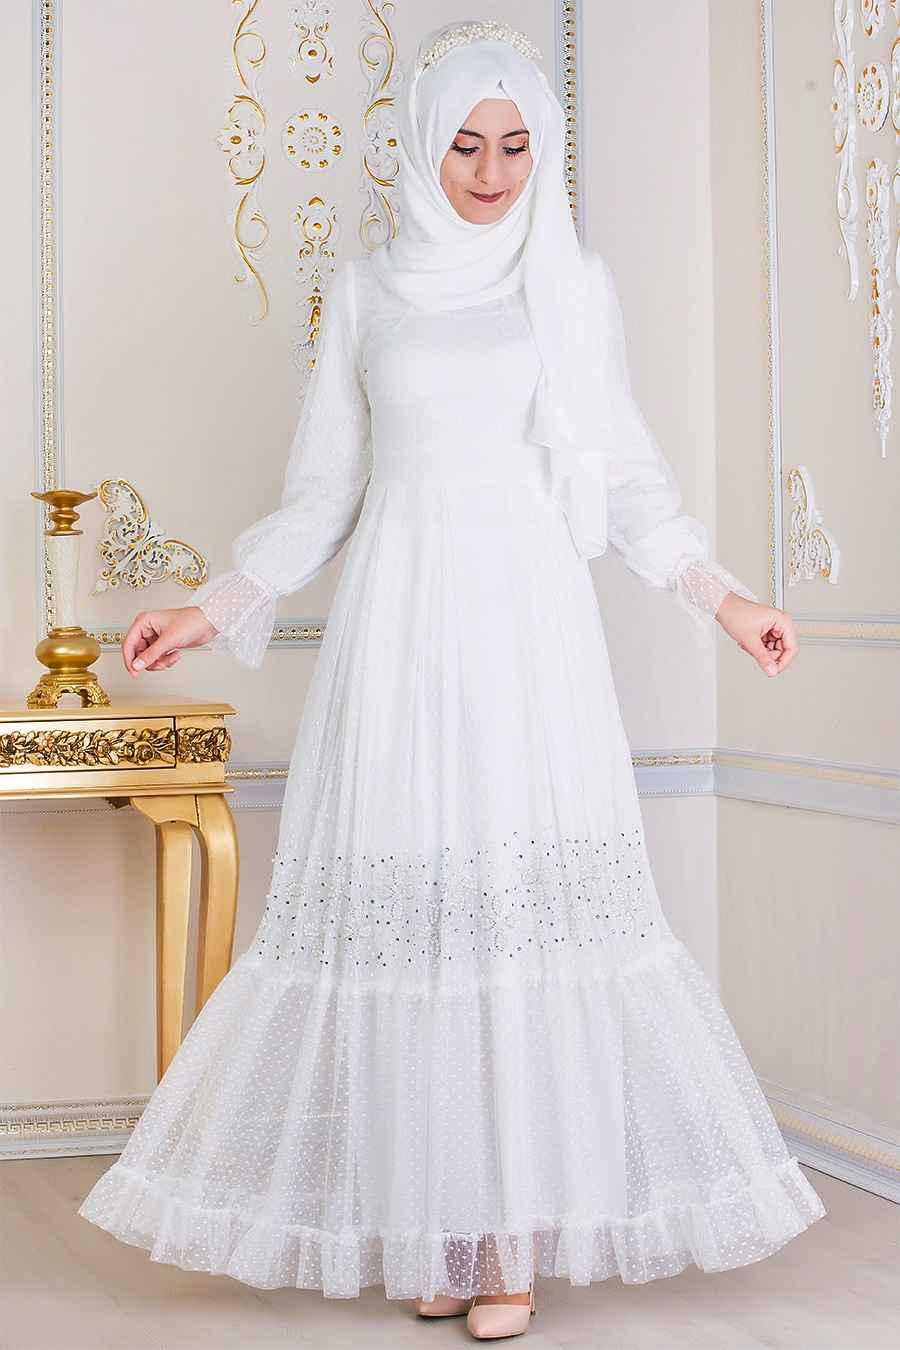 00f78d15d60af Feiza Collection Tesettür Tül Elbise Modelleri - Moda Tesettür Giyim